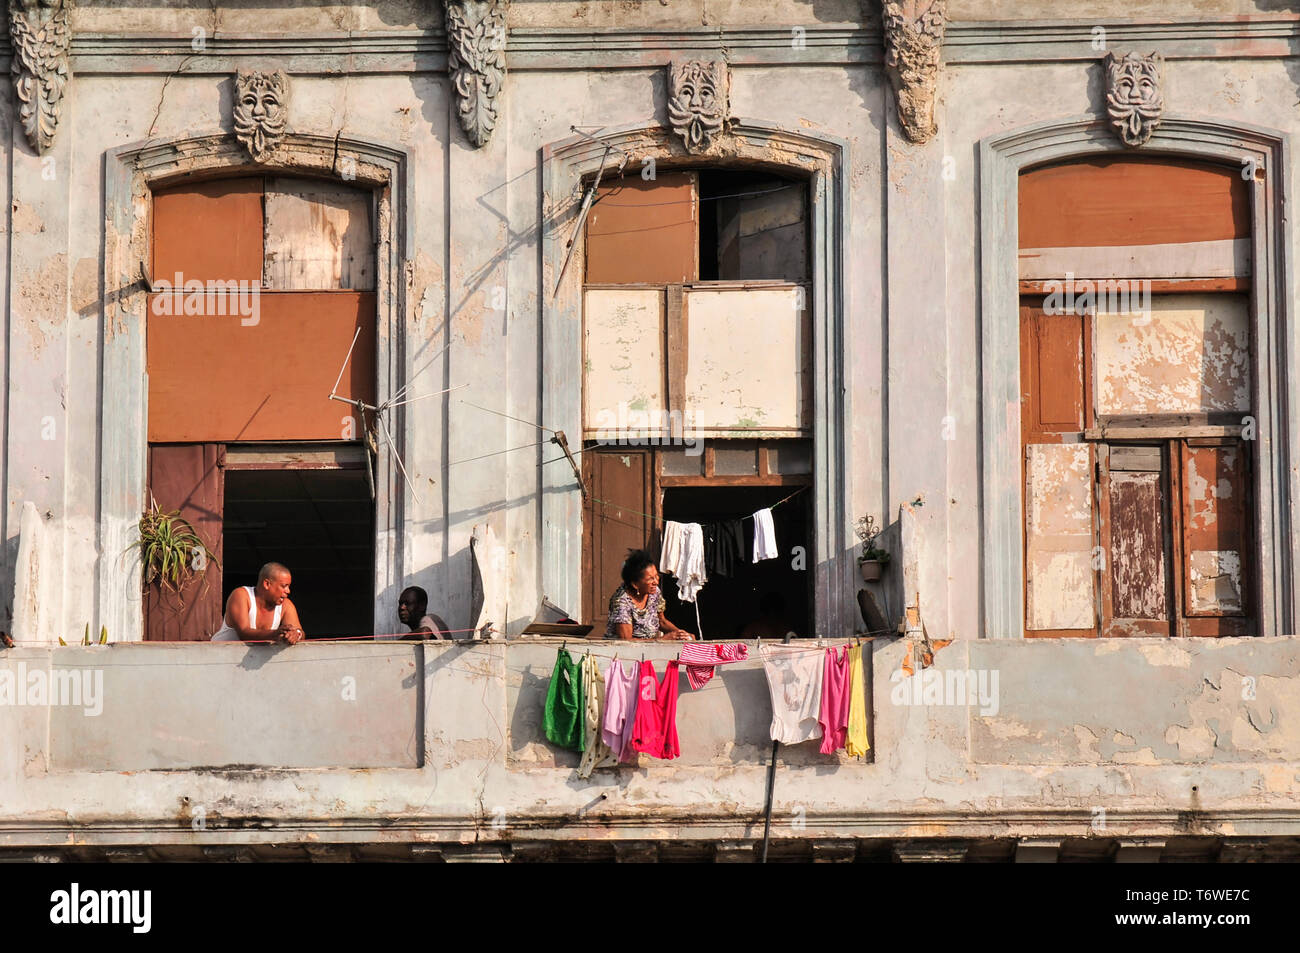 Family dry washing alond the Malecon, Havana Cuba Stock Photo